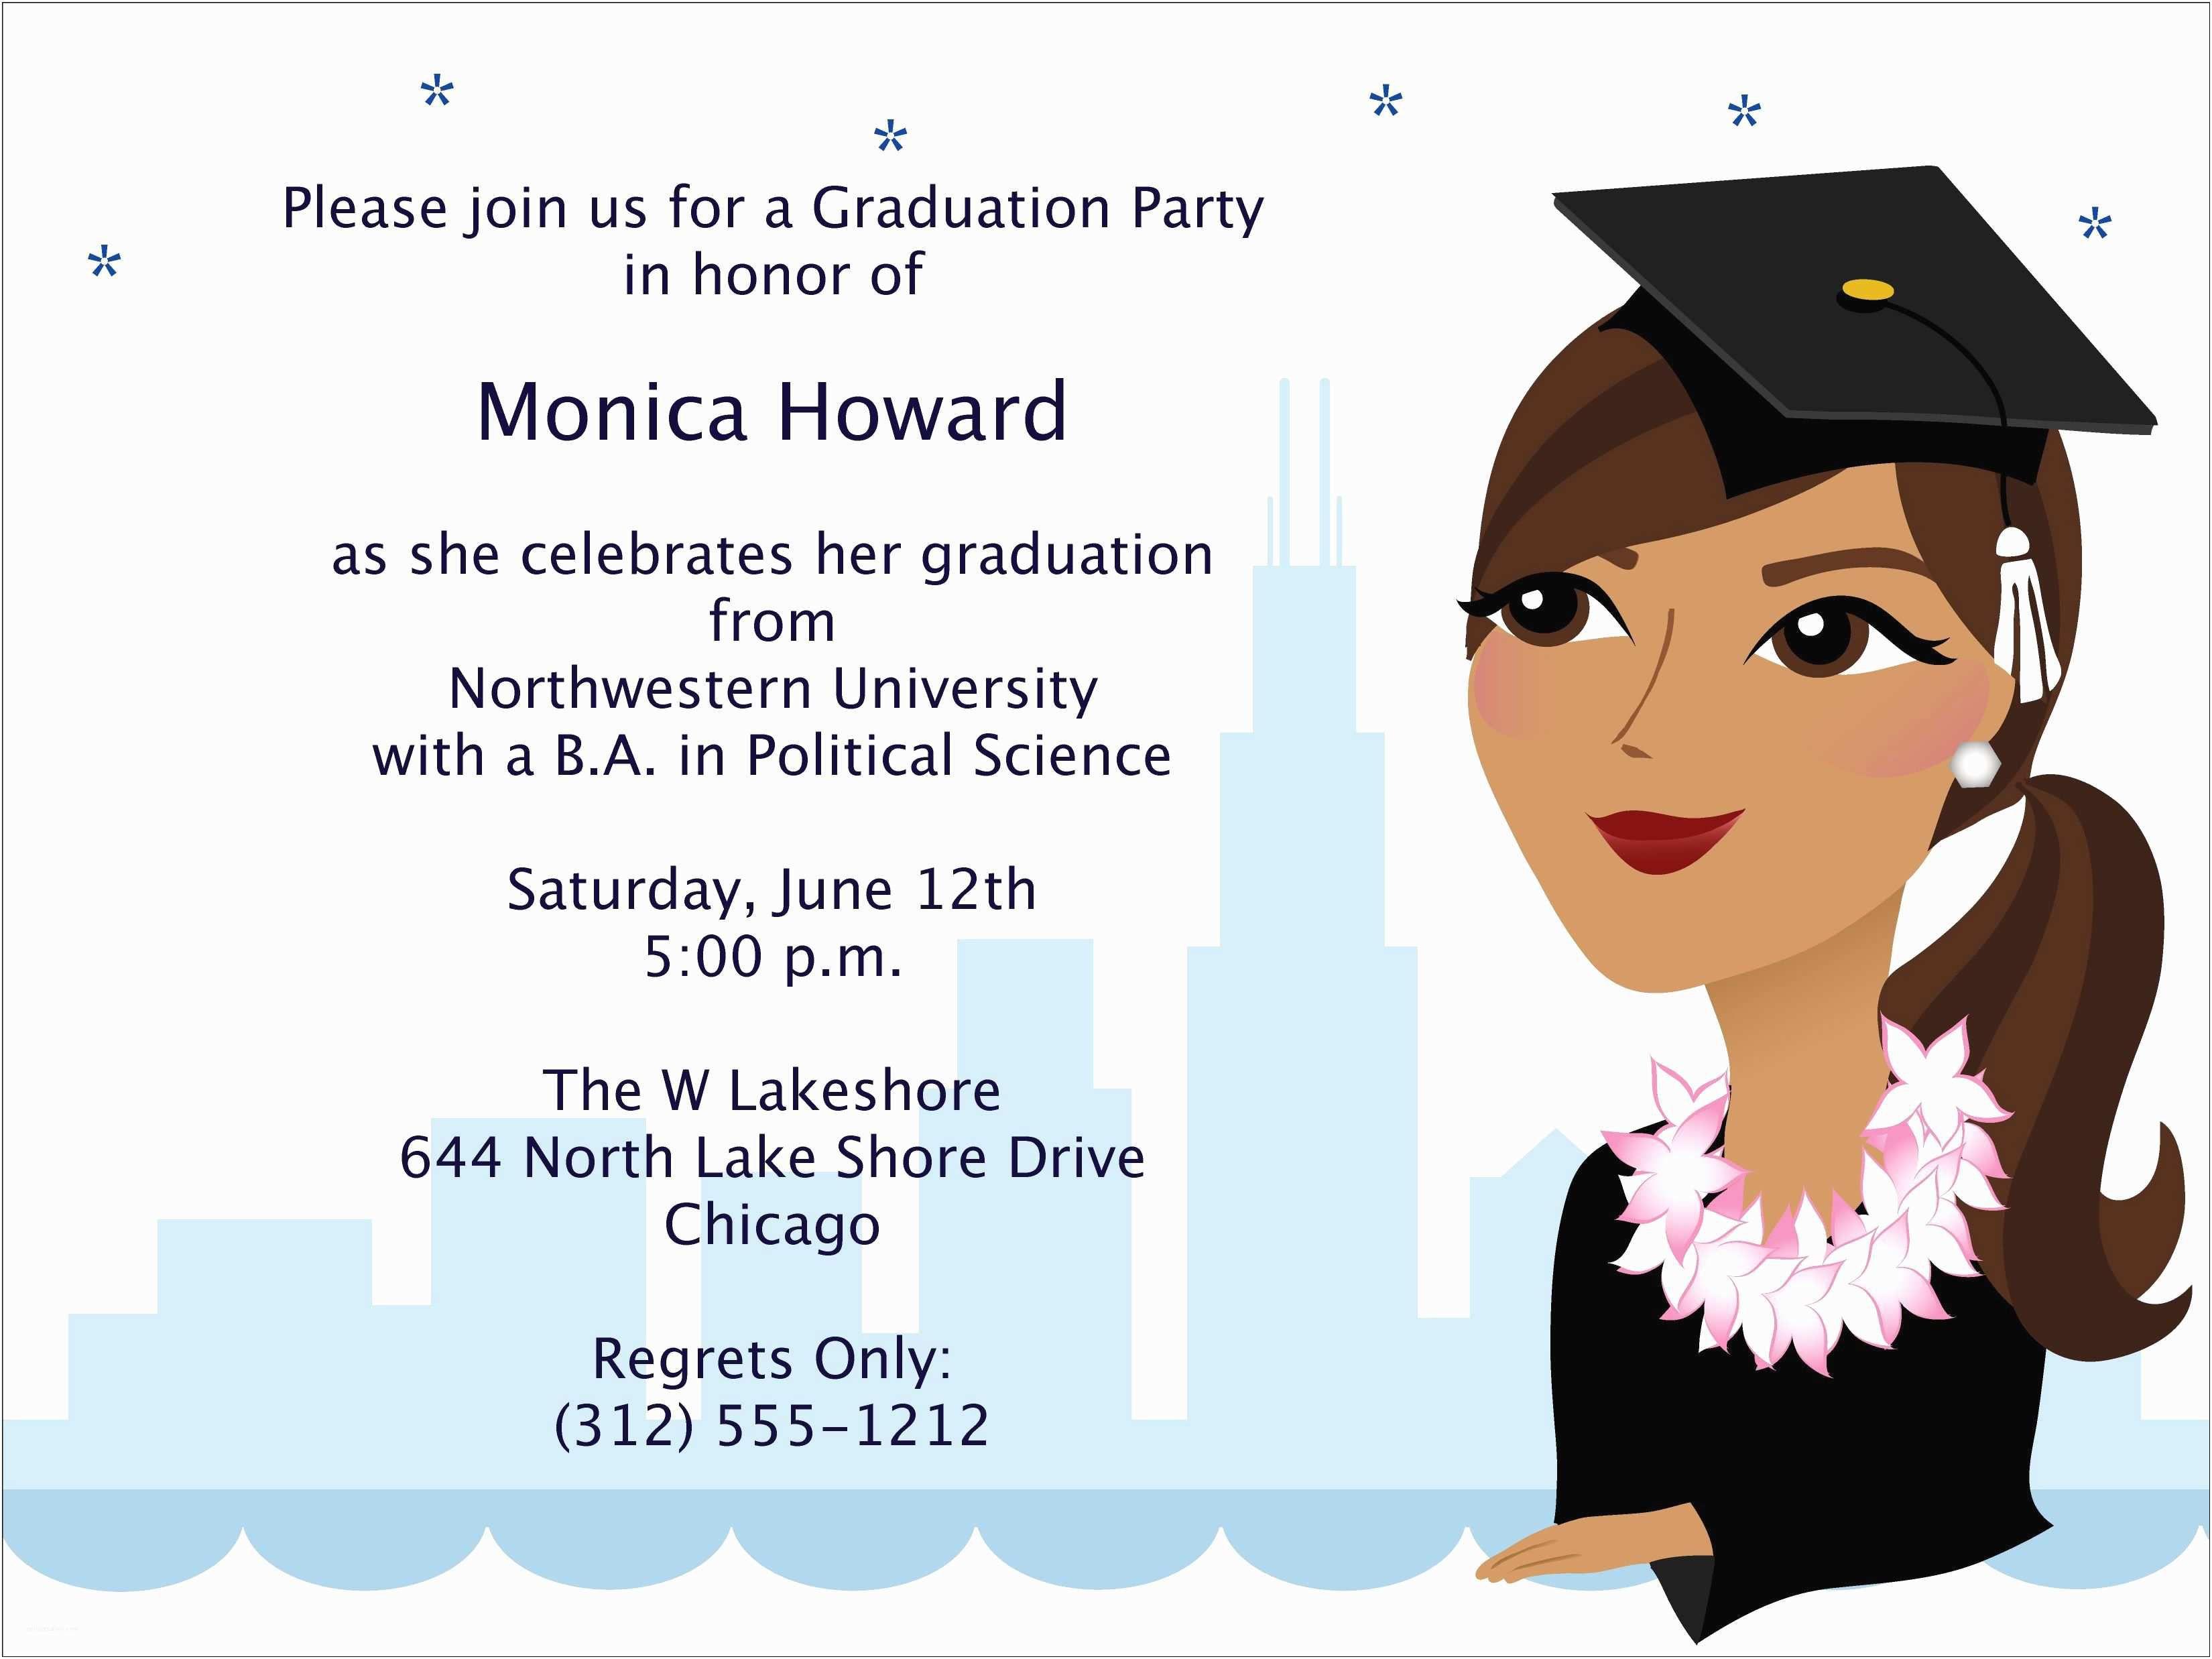 002 Wondrou College Graduation Party Invitation Template High Definition  TemplatesFull